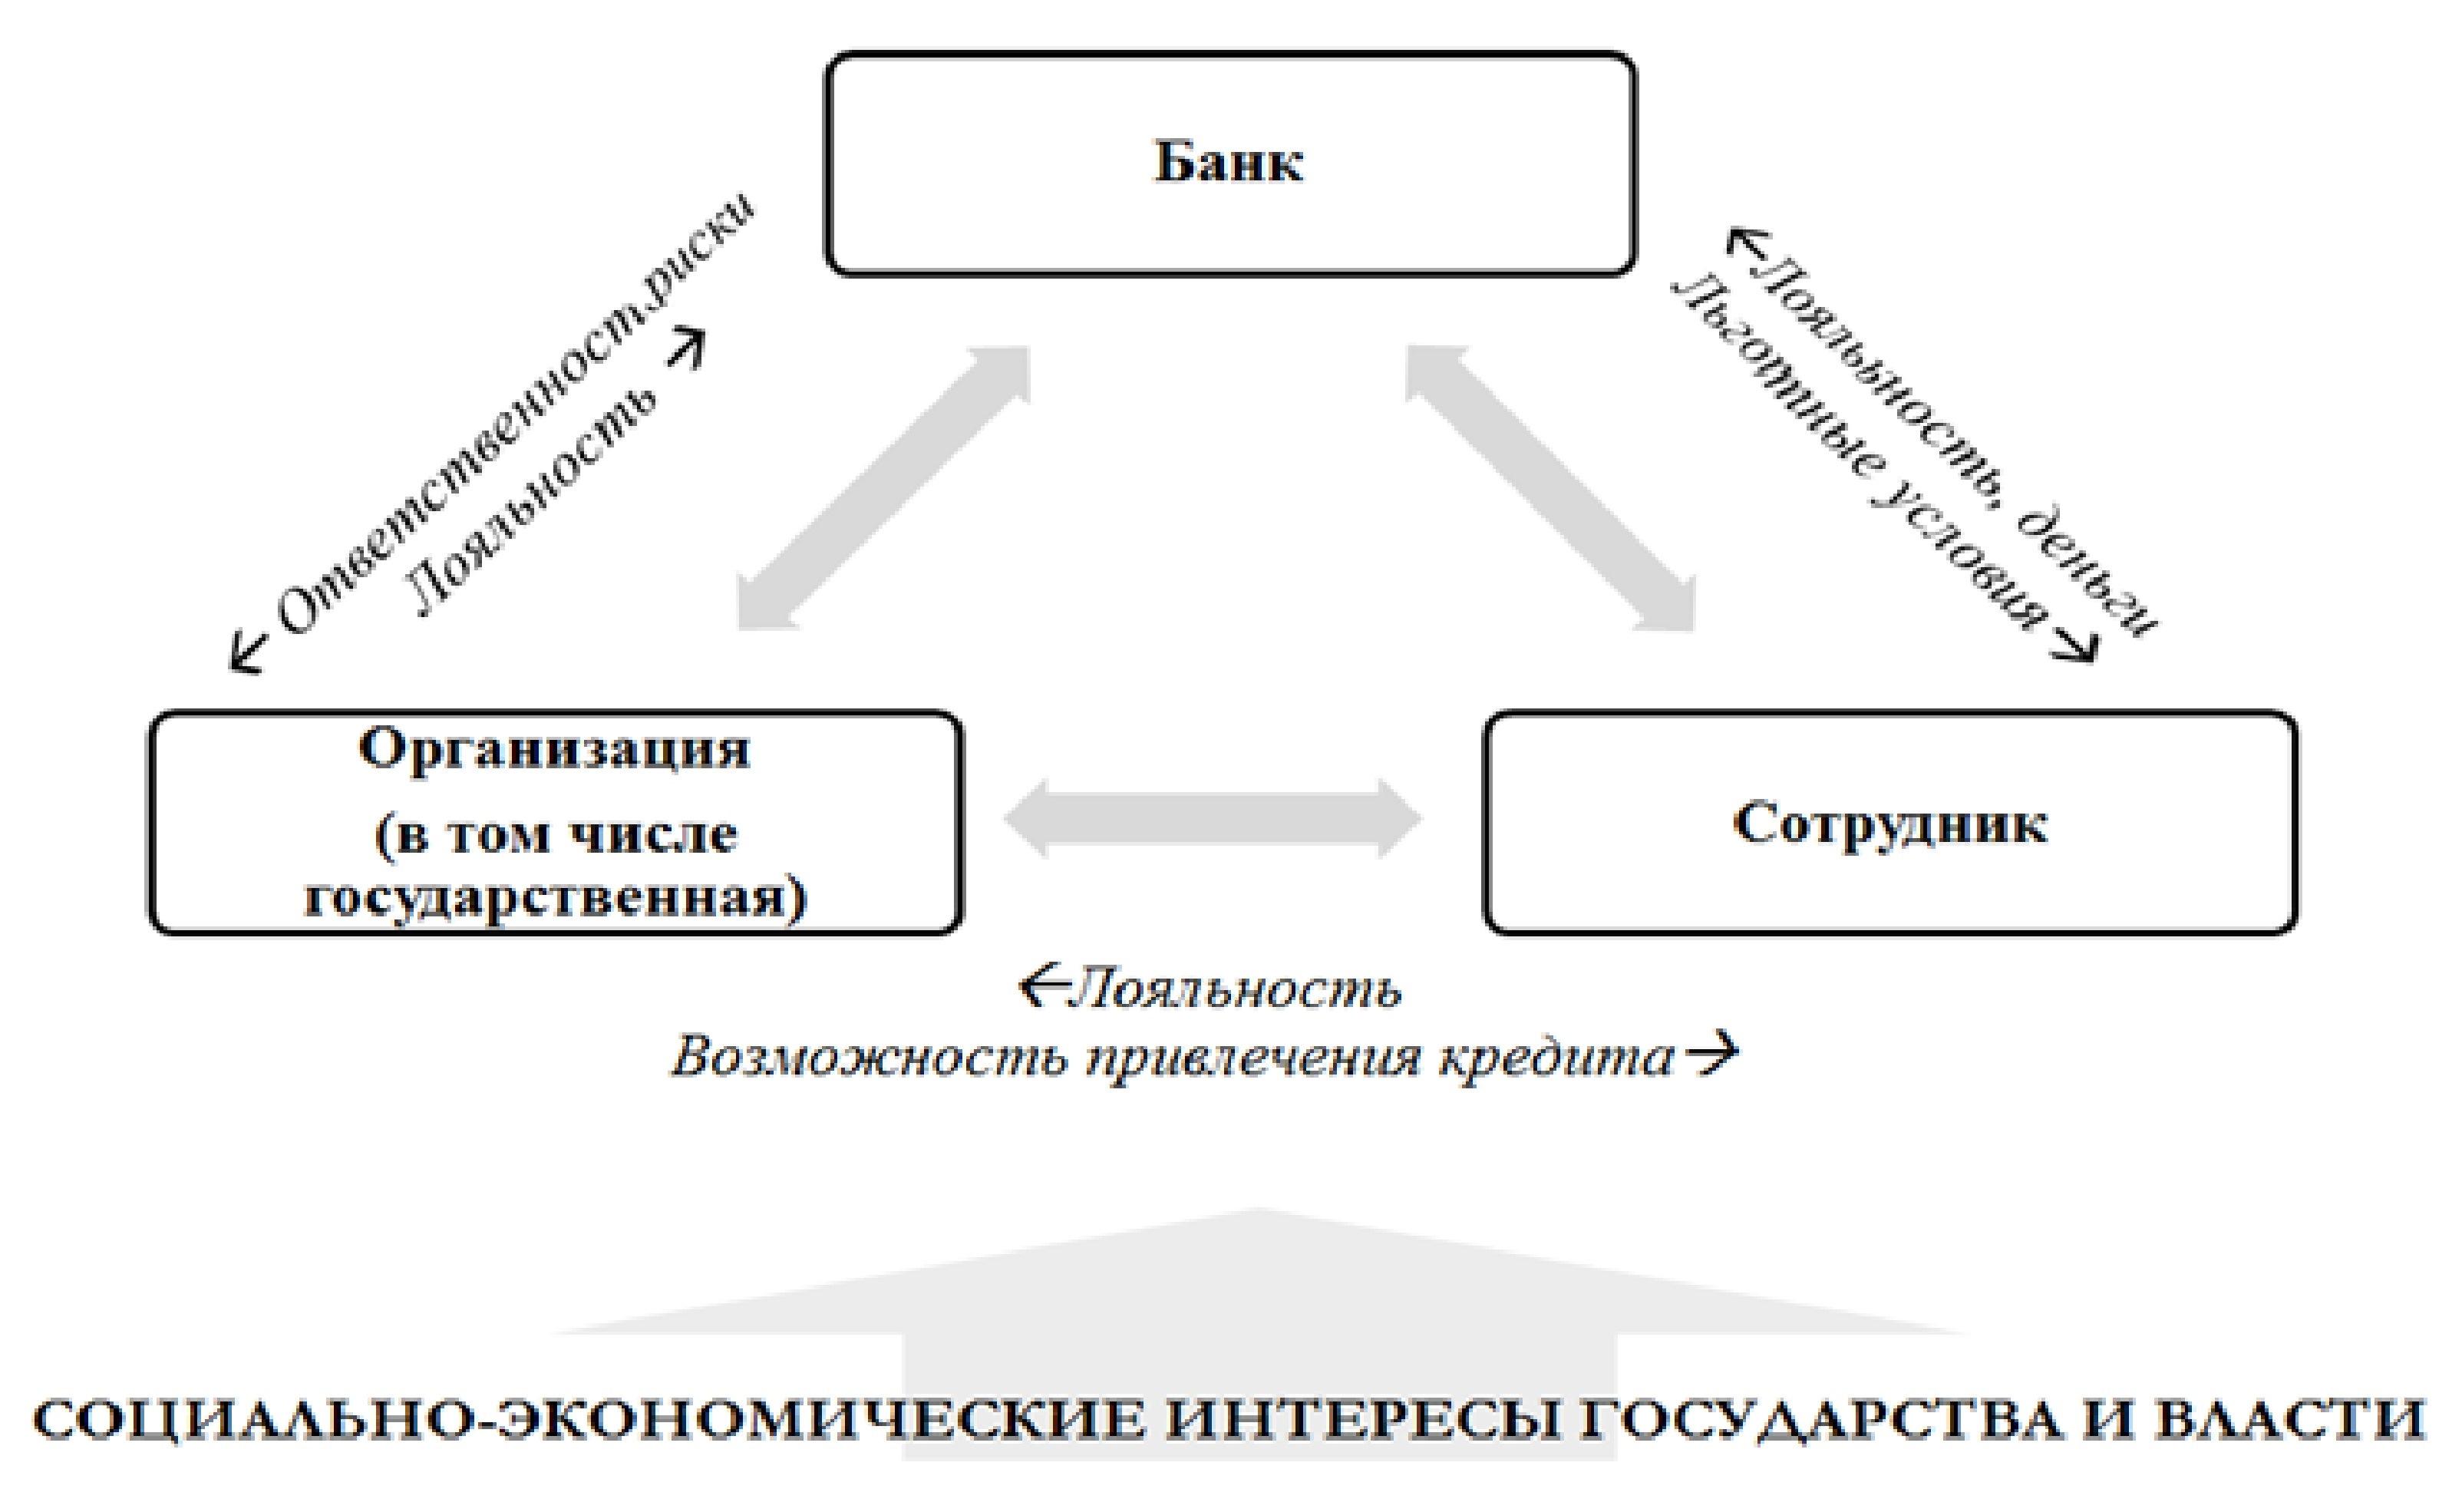 Взаимосвязь субъектов рынка корпоративного кредитования